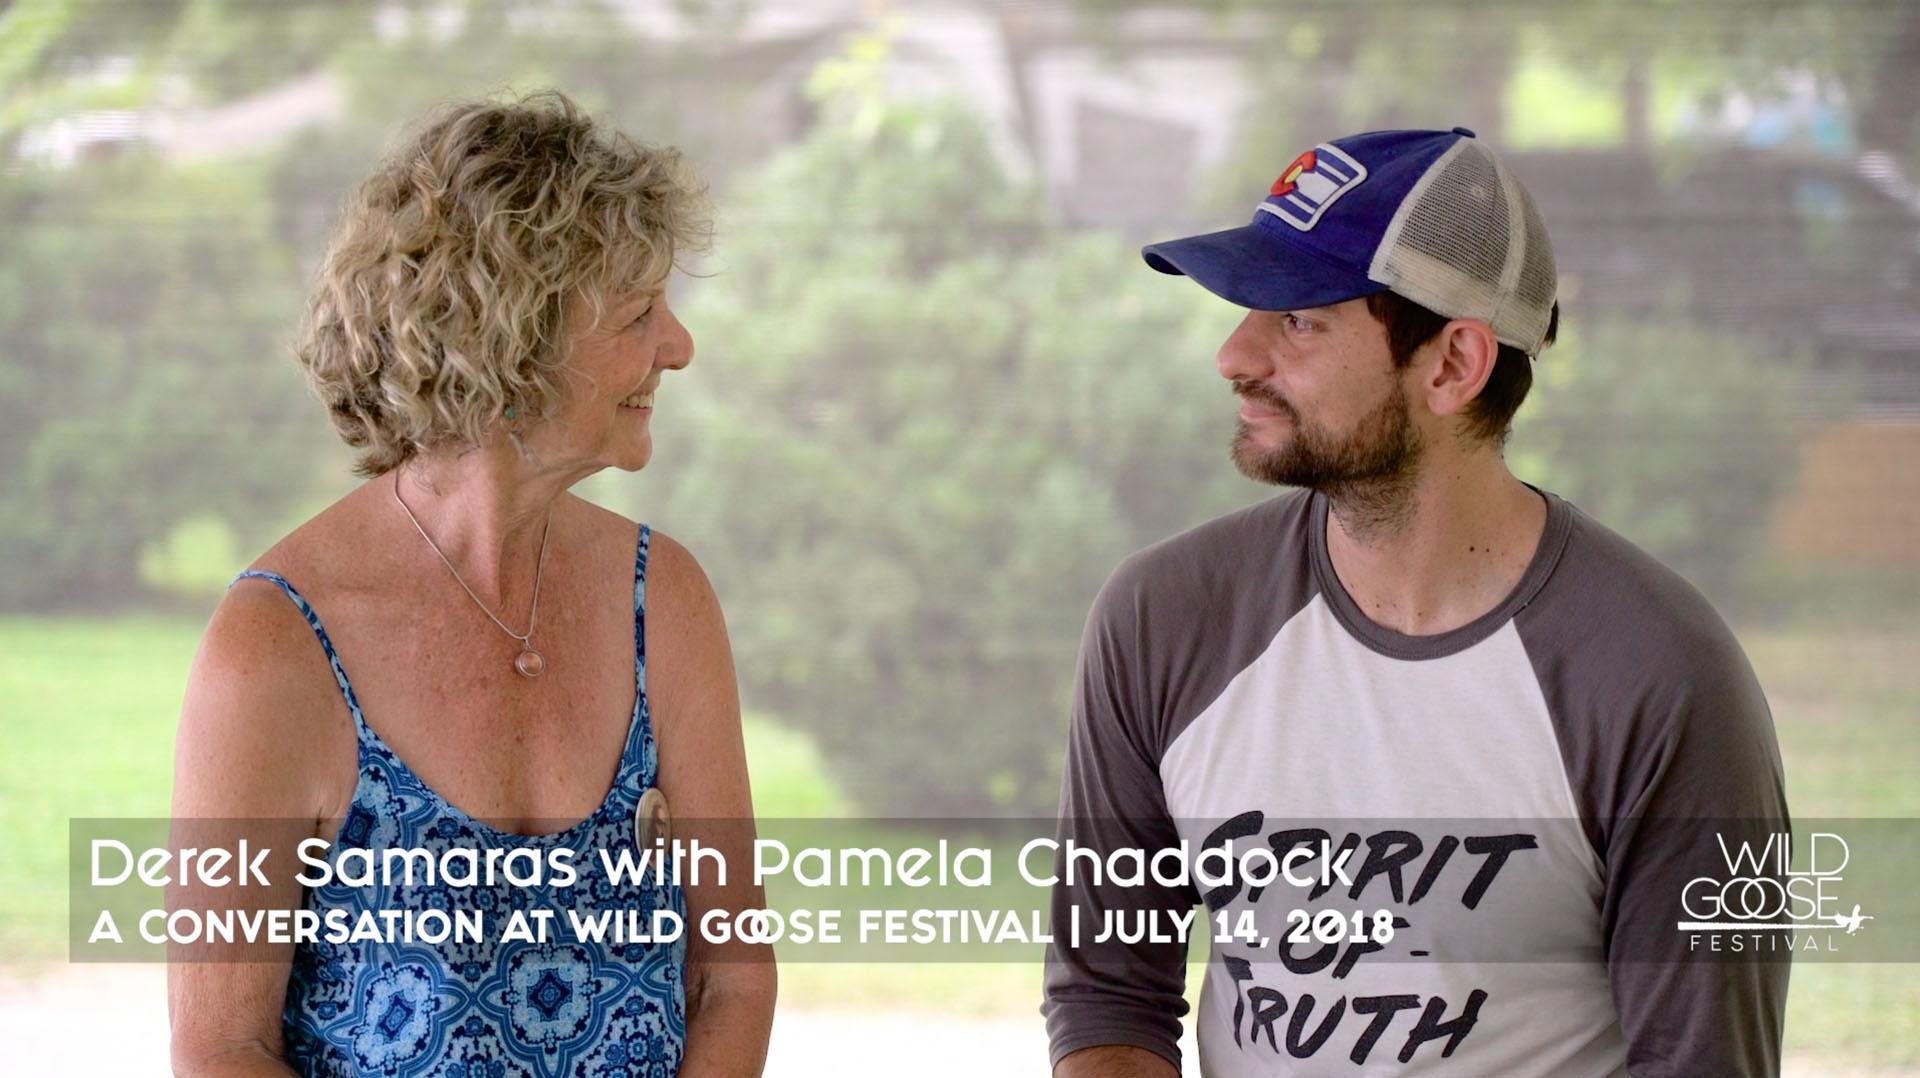 Derek Samaras & Pamela Chaddock